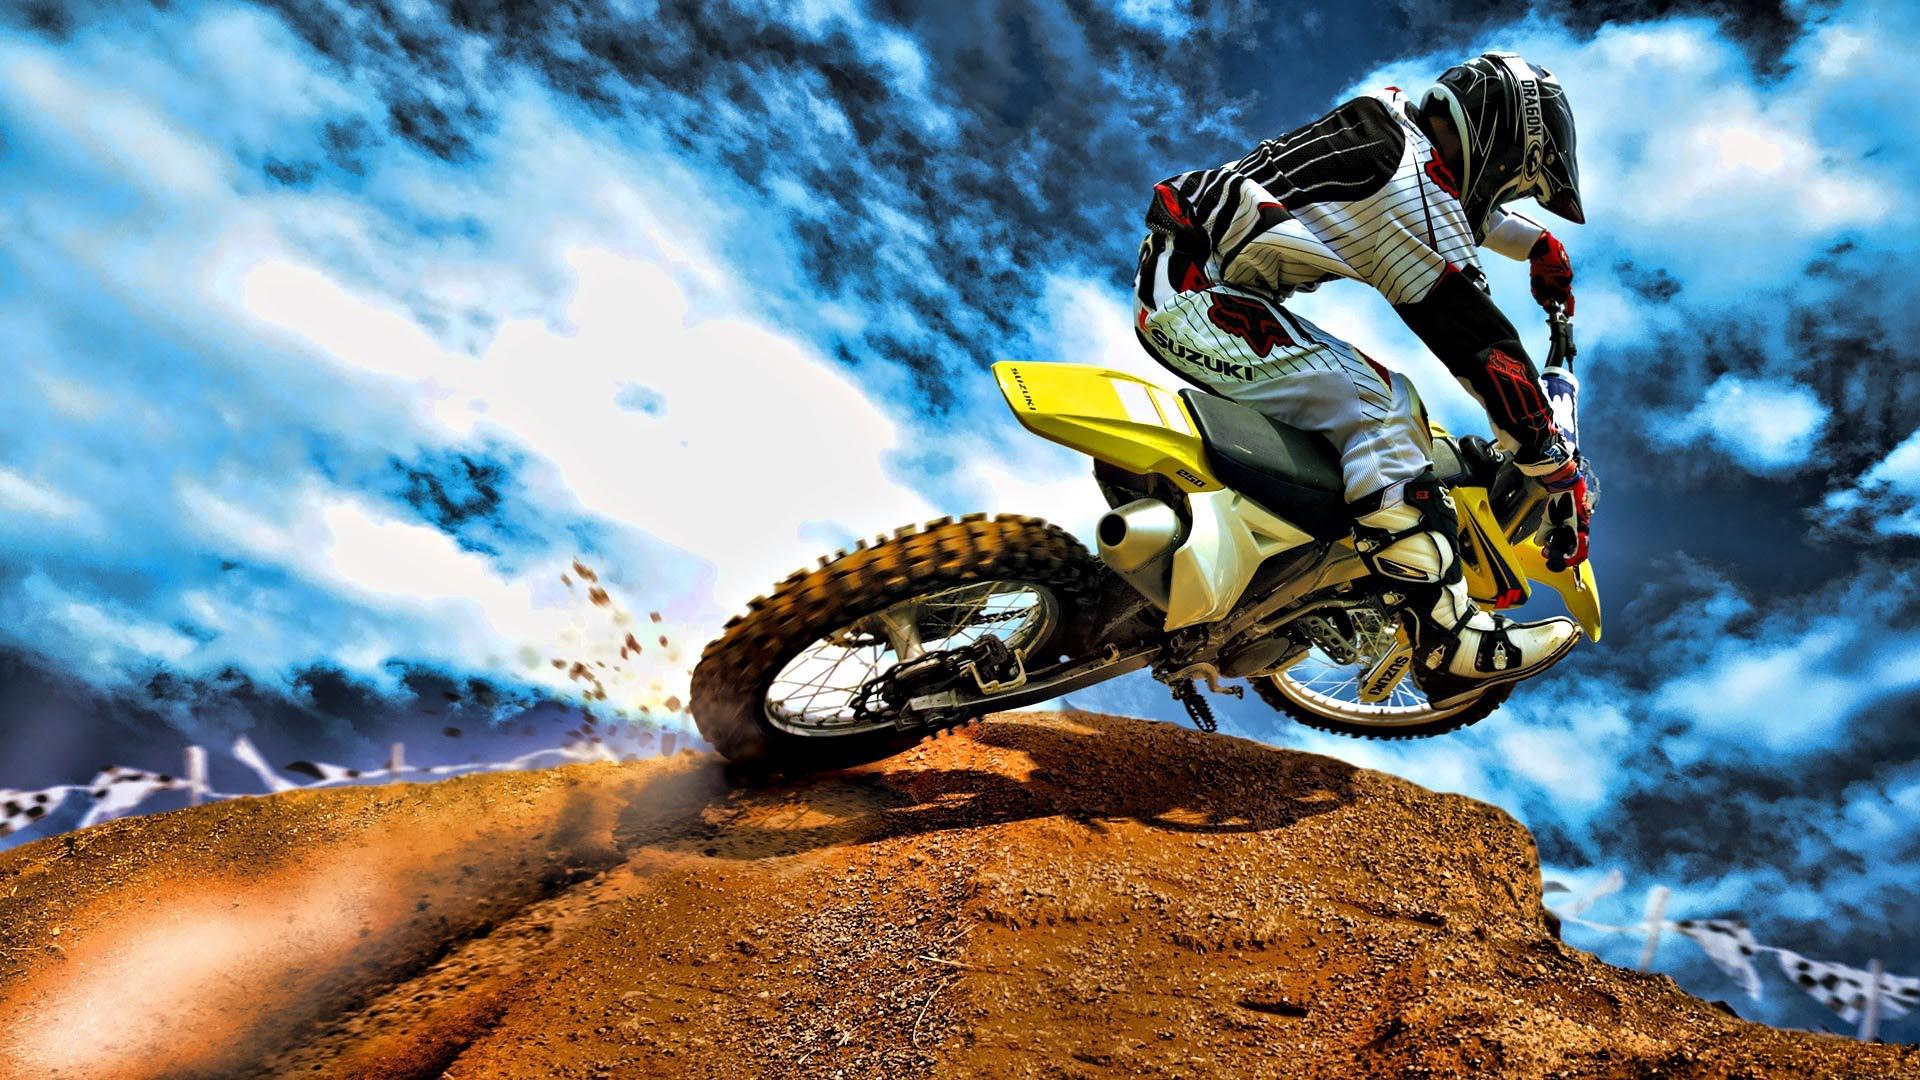 Motocross HDR Bike HD Wallpaper FullHDWpp   Full HD Wallpapers 1920x1080